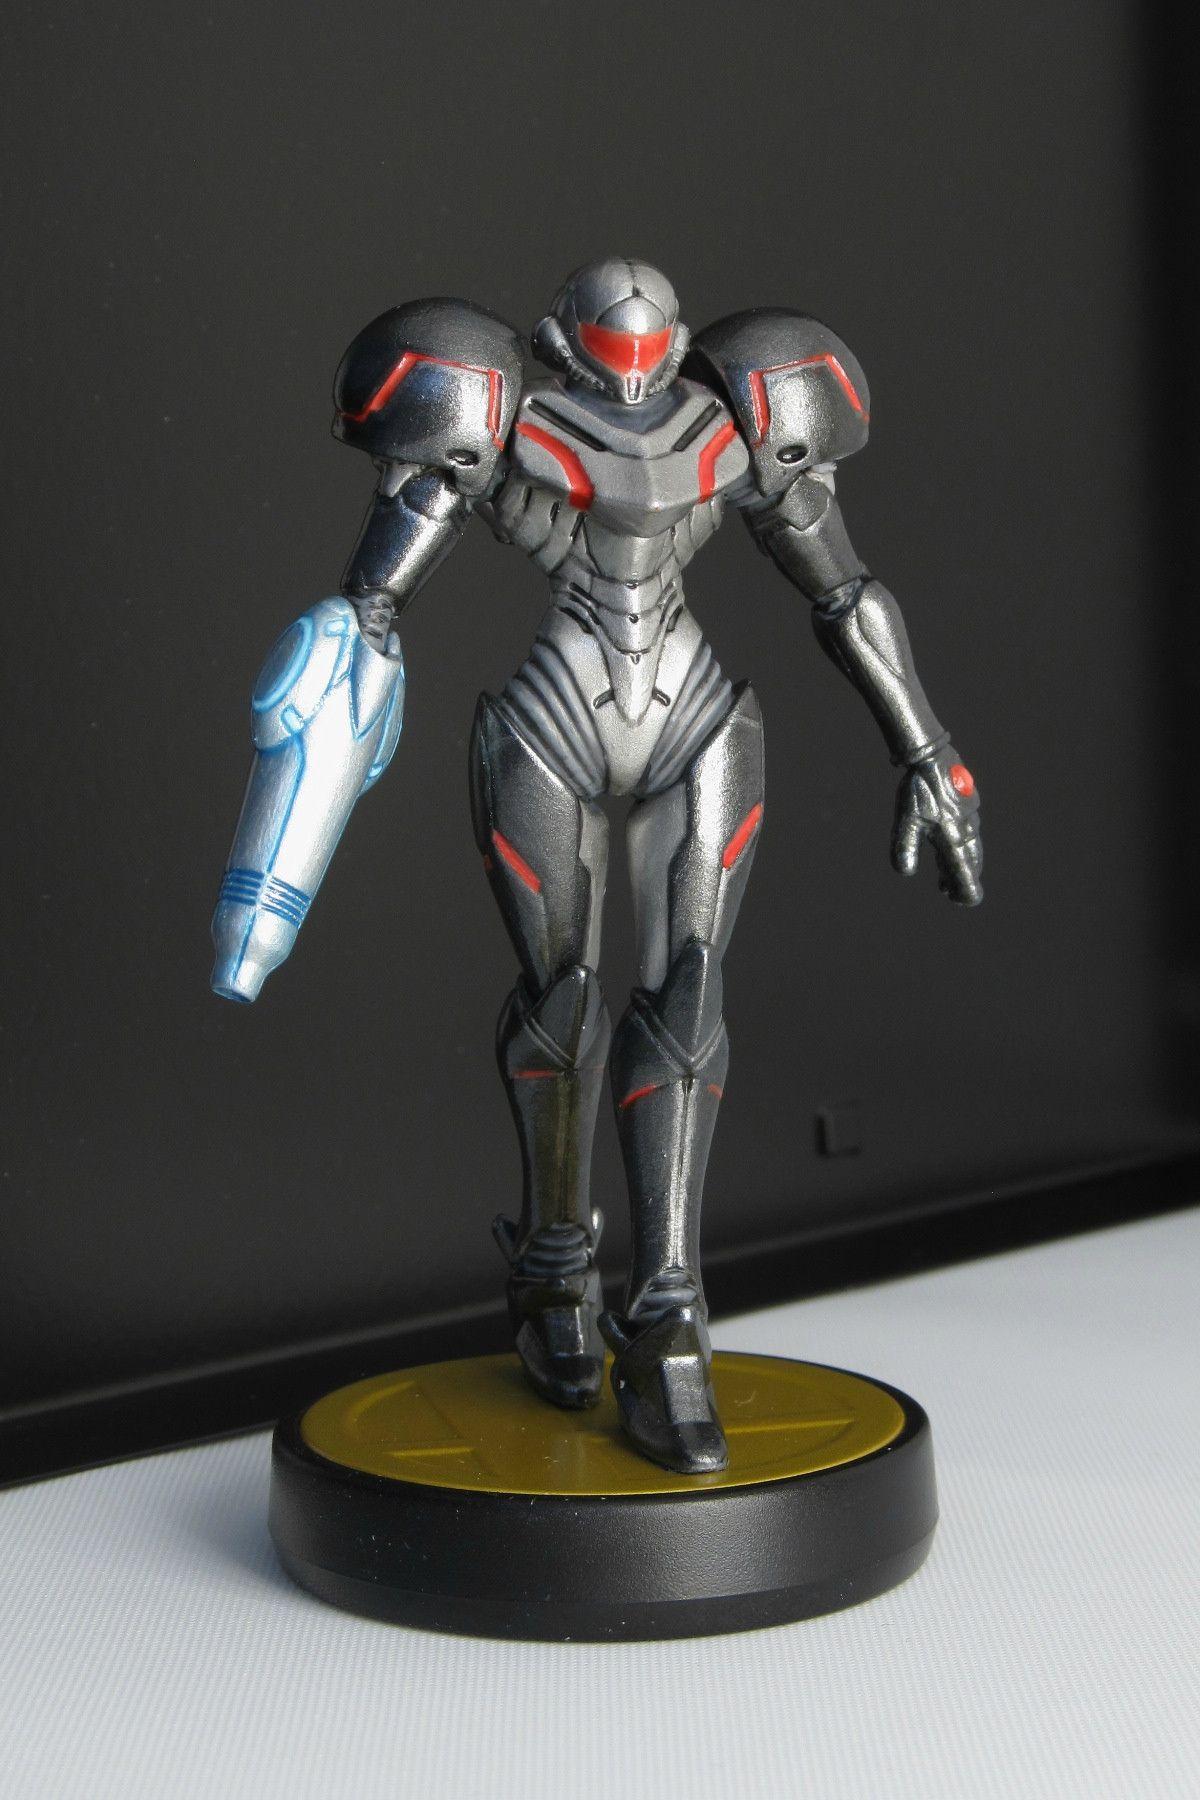 Phazon Suit Samus Amiibo Metroid, Super metroid, Cosplay